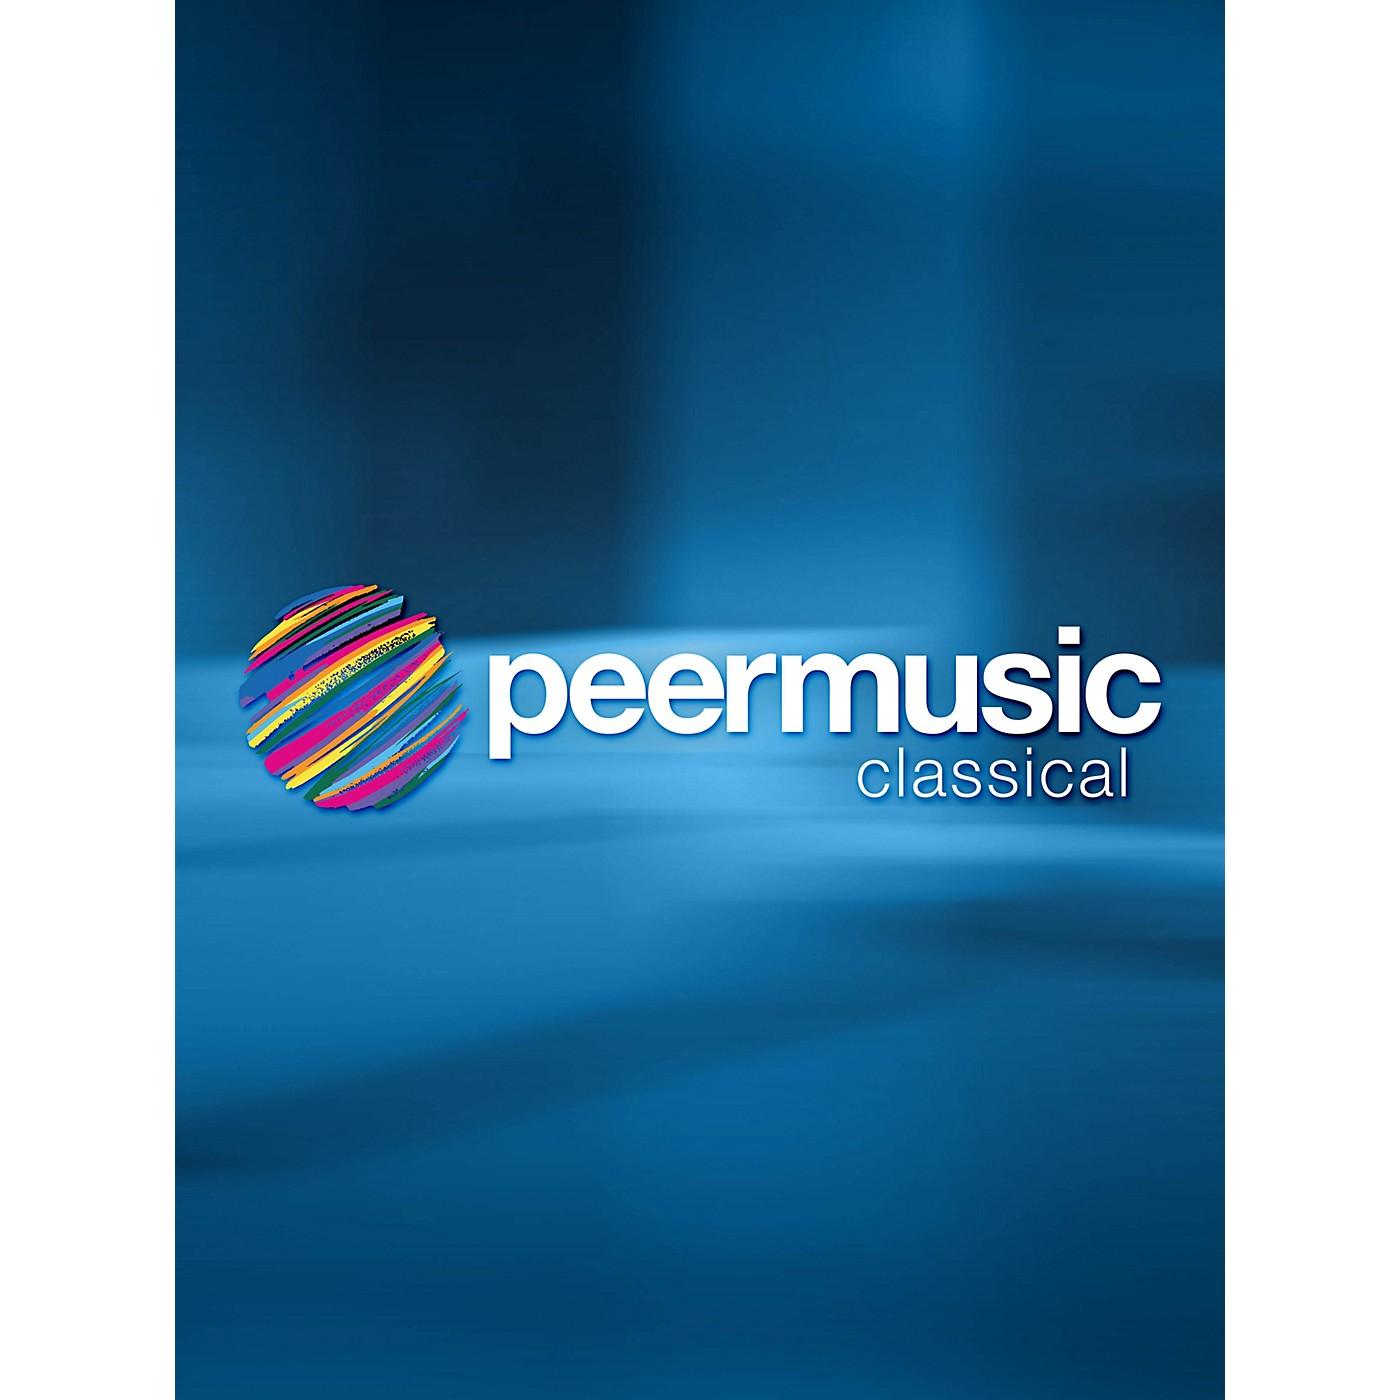 Peer Music 2 Danzas Cubanas (Piano Solo) Peermusic Classical Series Softcover thumbnail